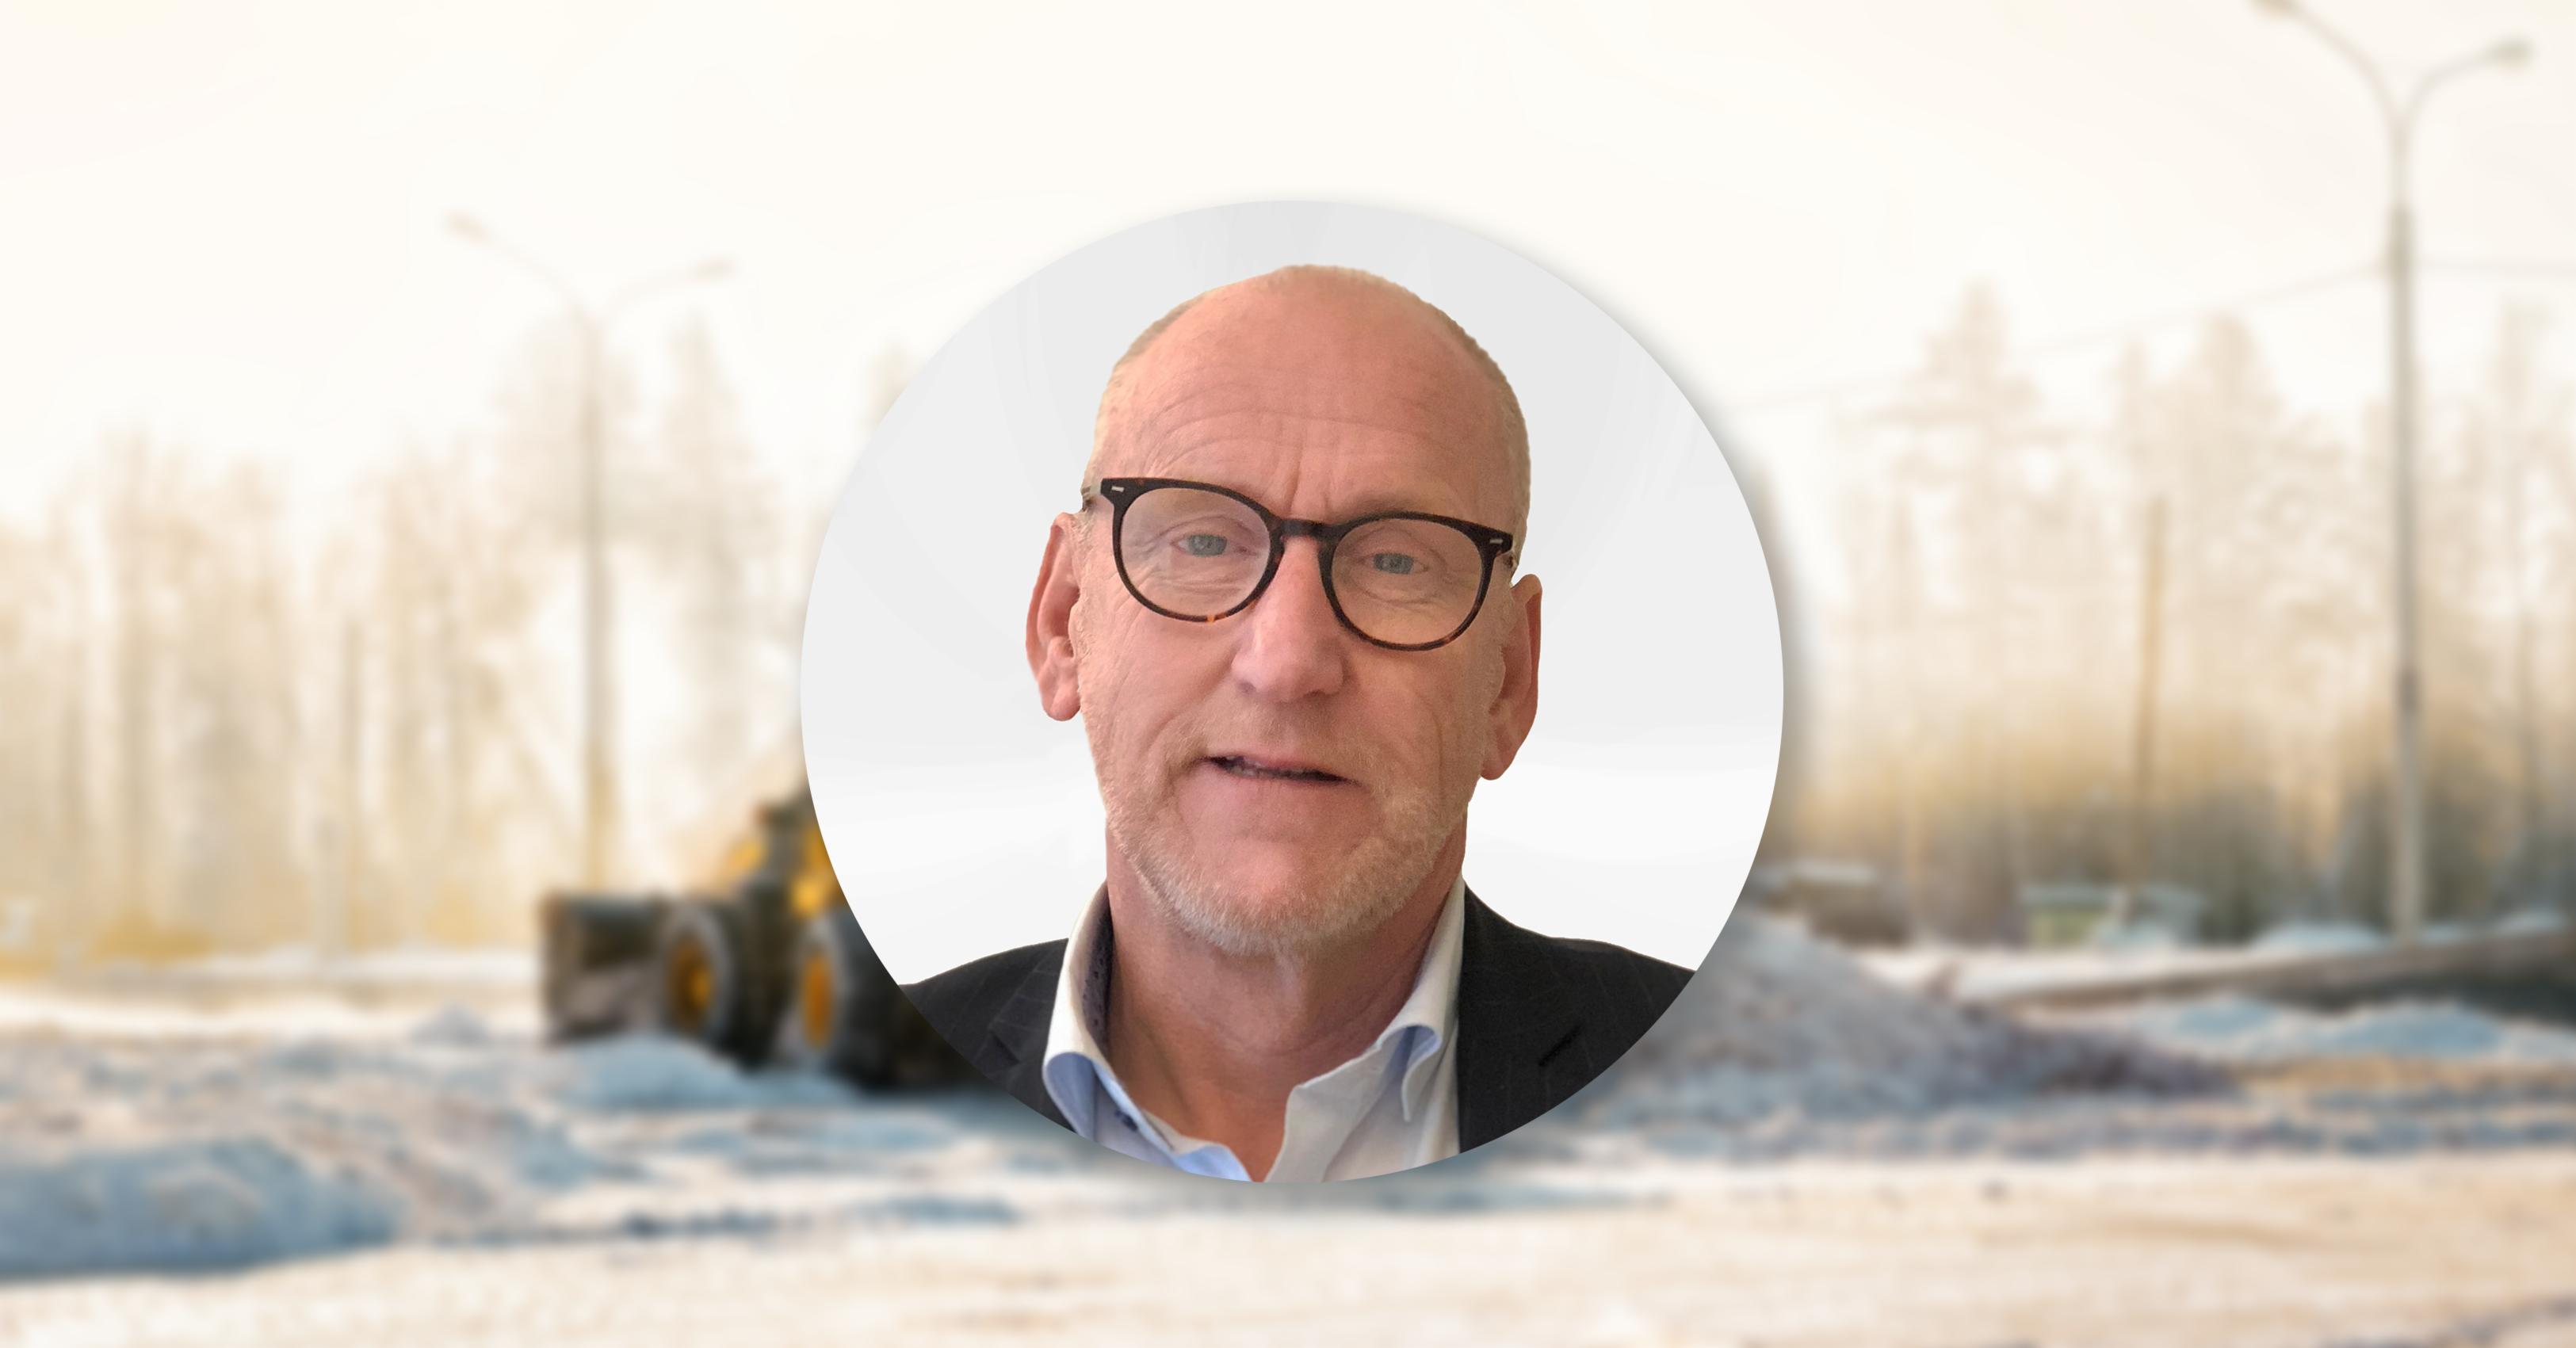 Kubicom Per Lundgren grundare